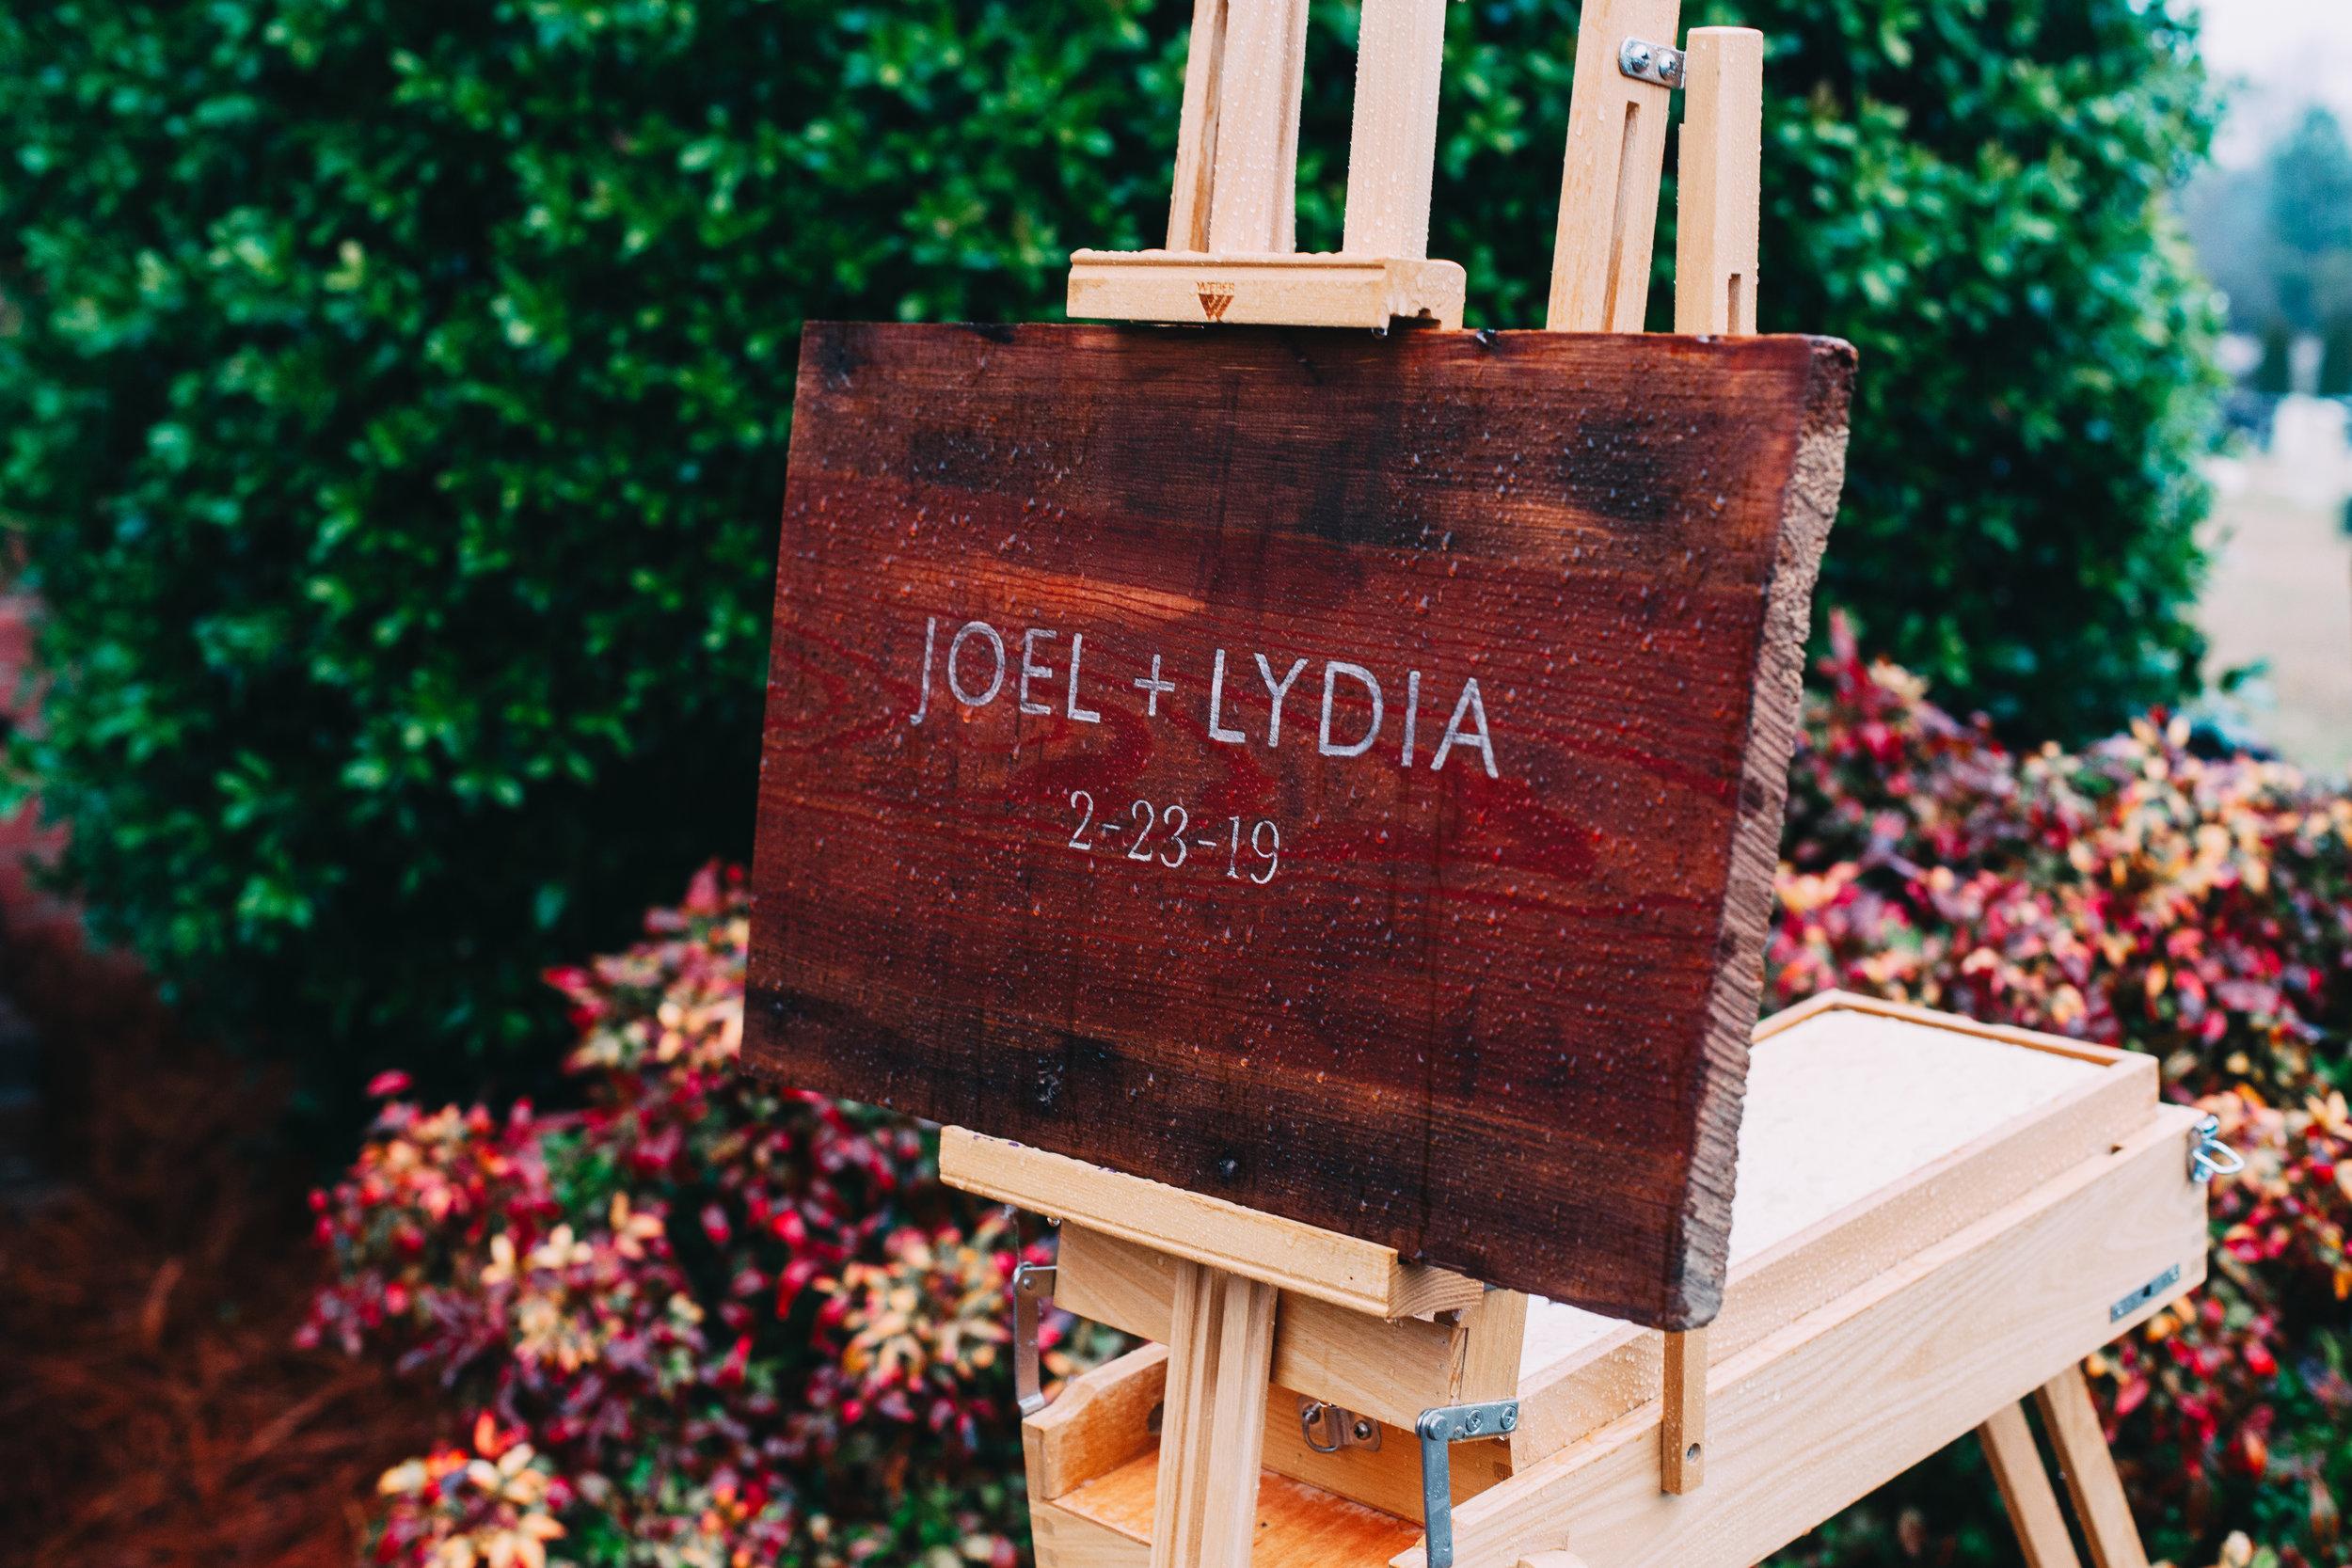 Joel+Lydia-90.jpg